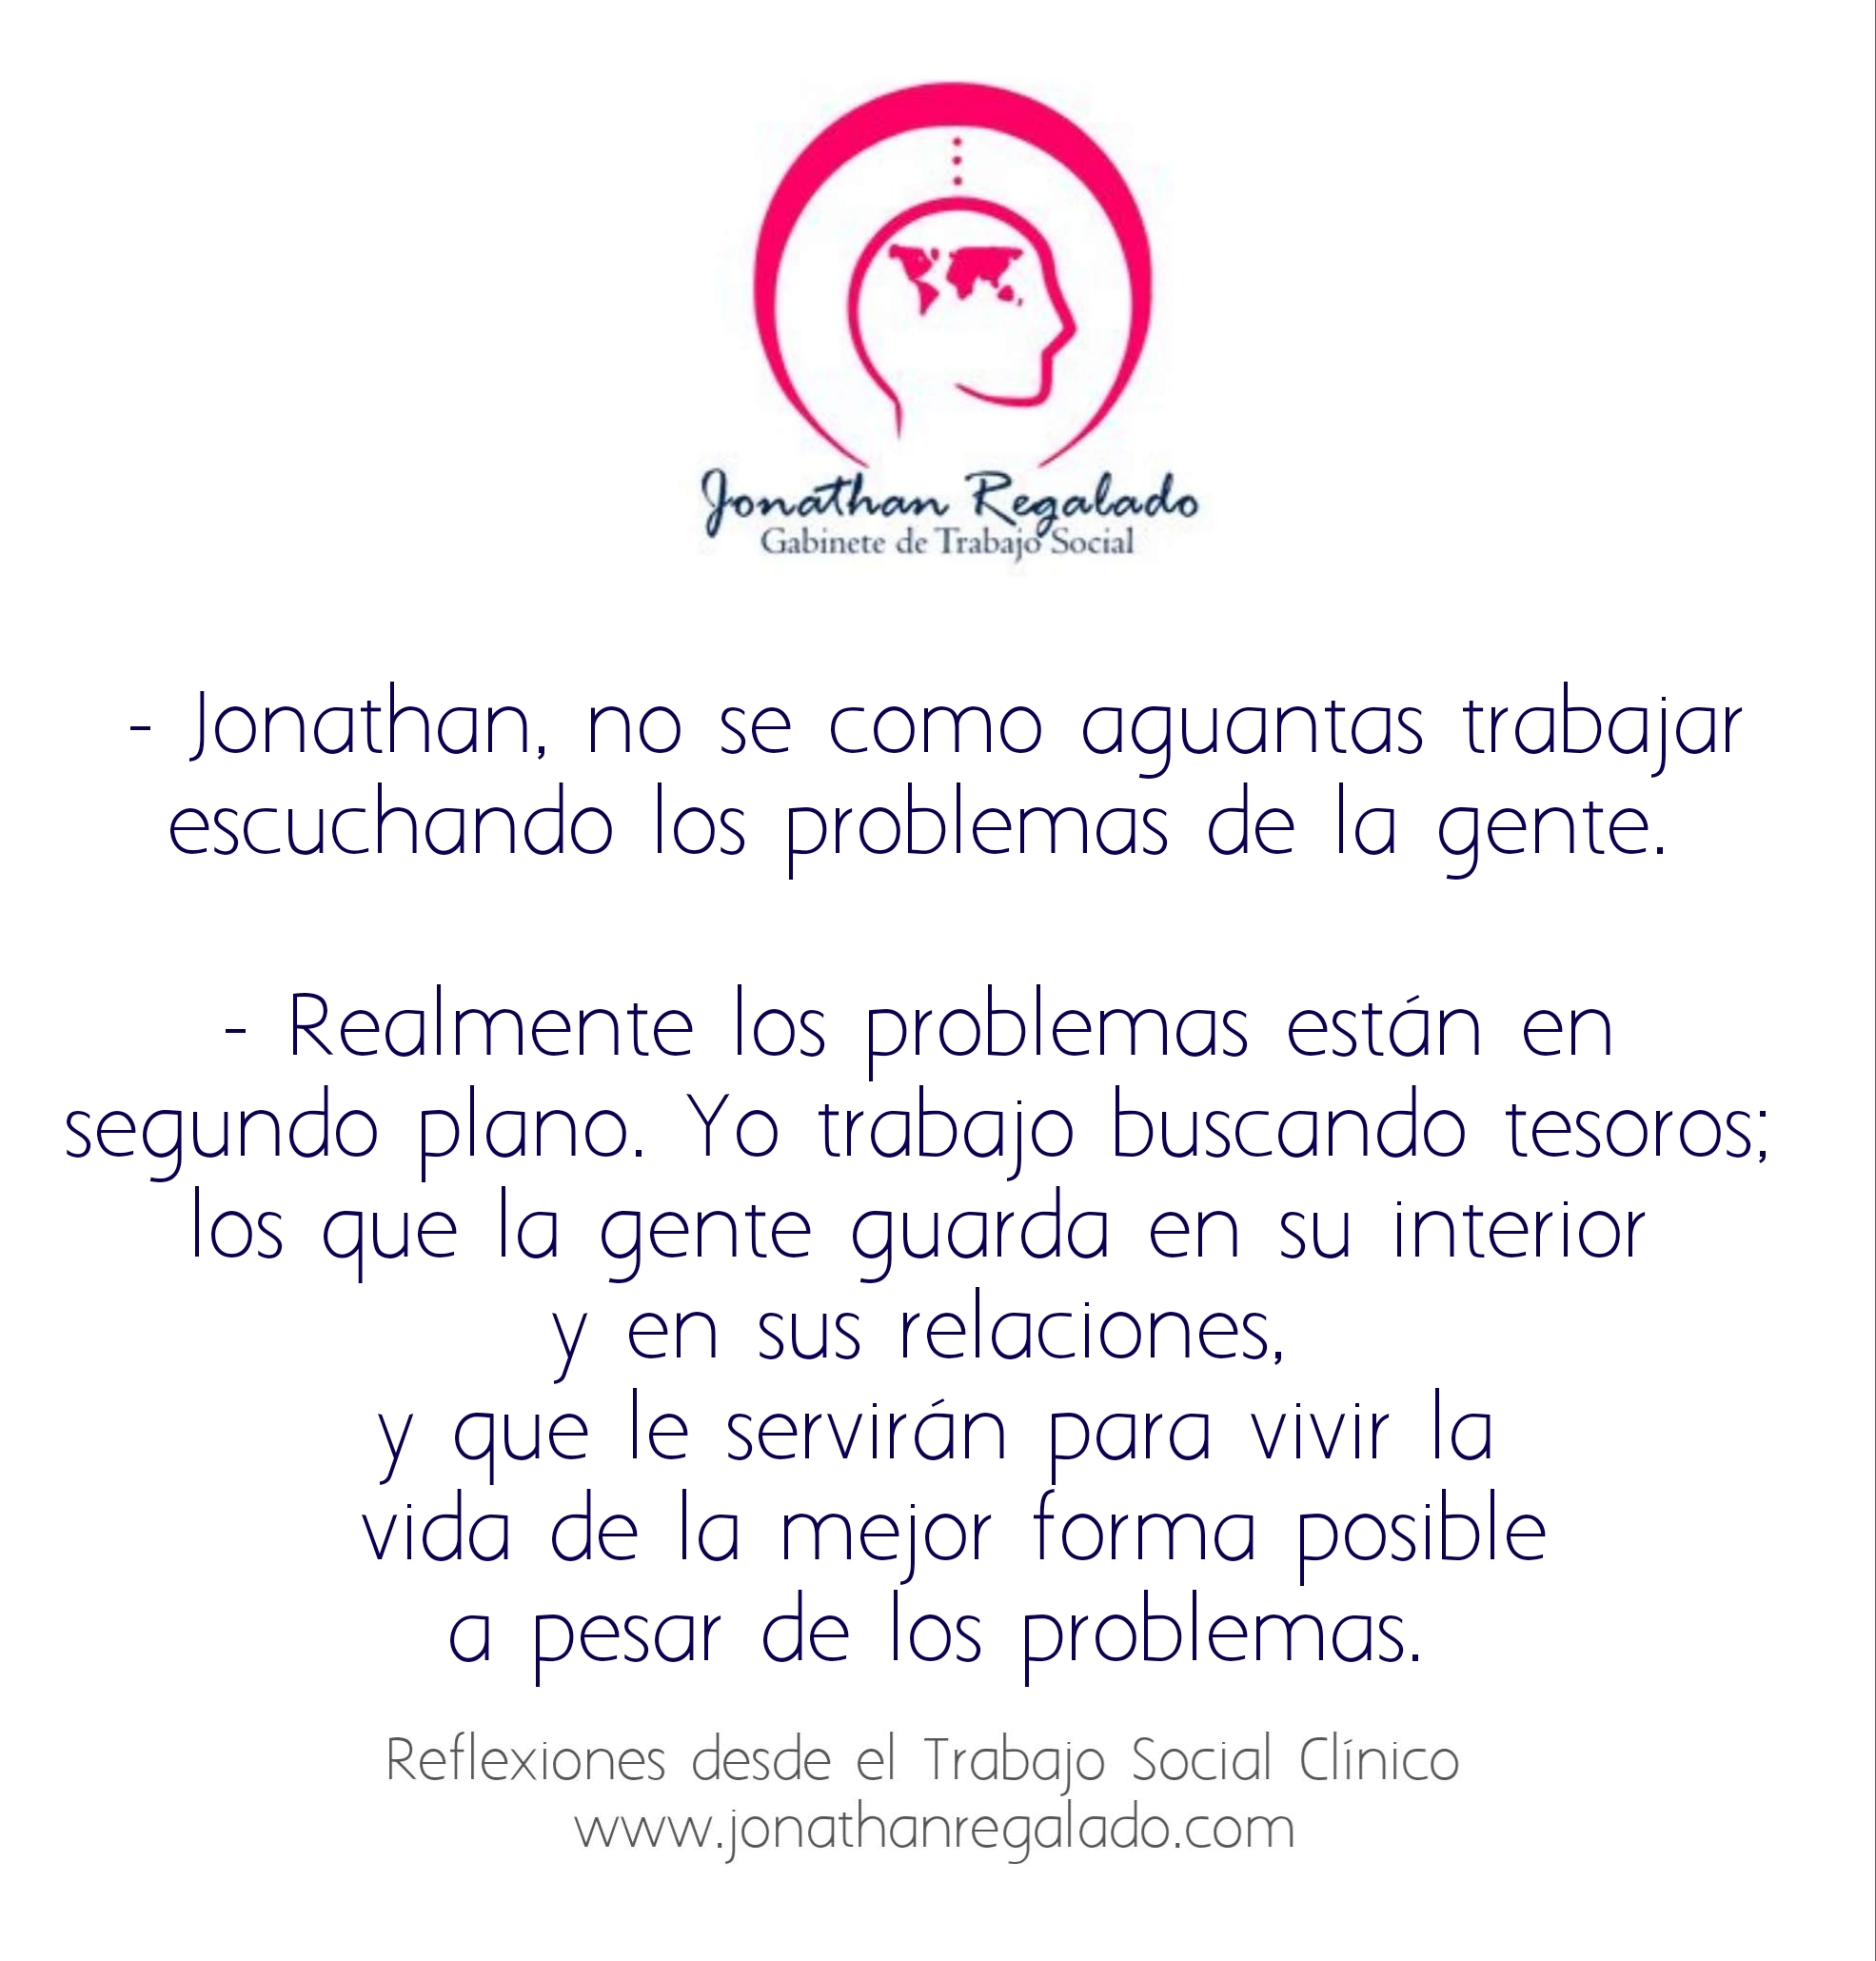 Blanco_193447661913711